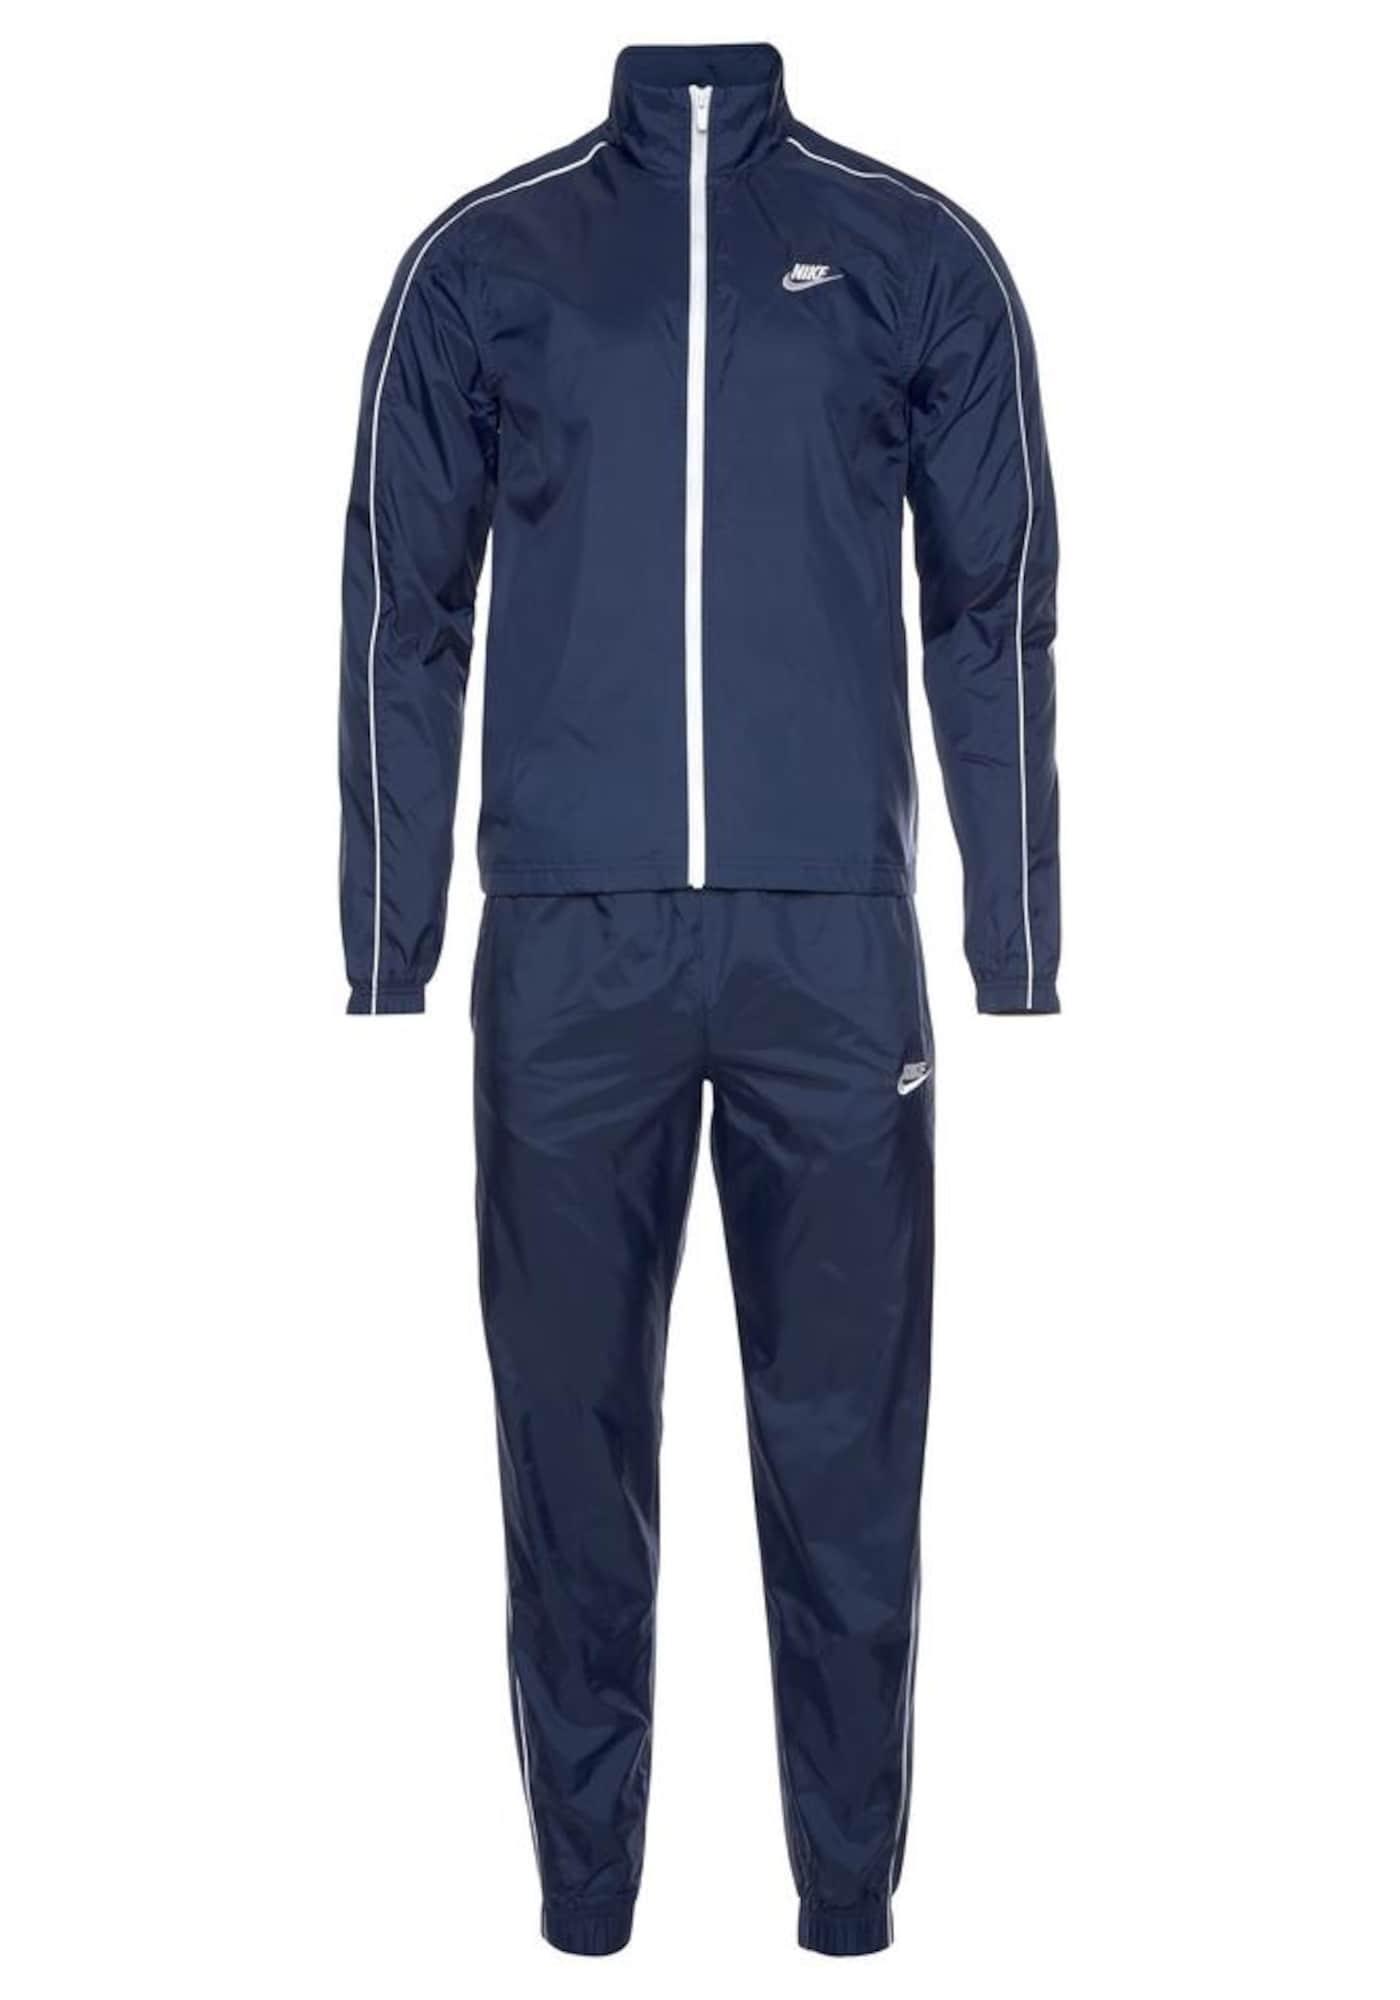 Jogginganzug | Sportbekleidung > Sportanzüge > Jogginganzüge | Nike Sportswear